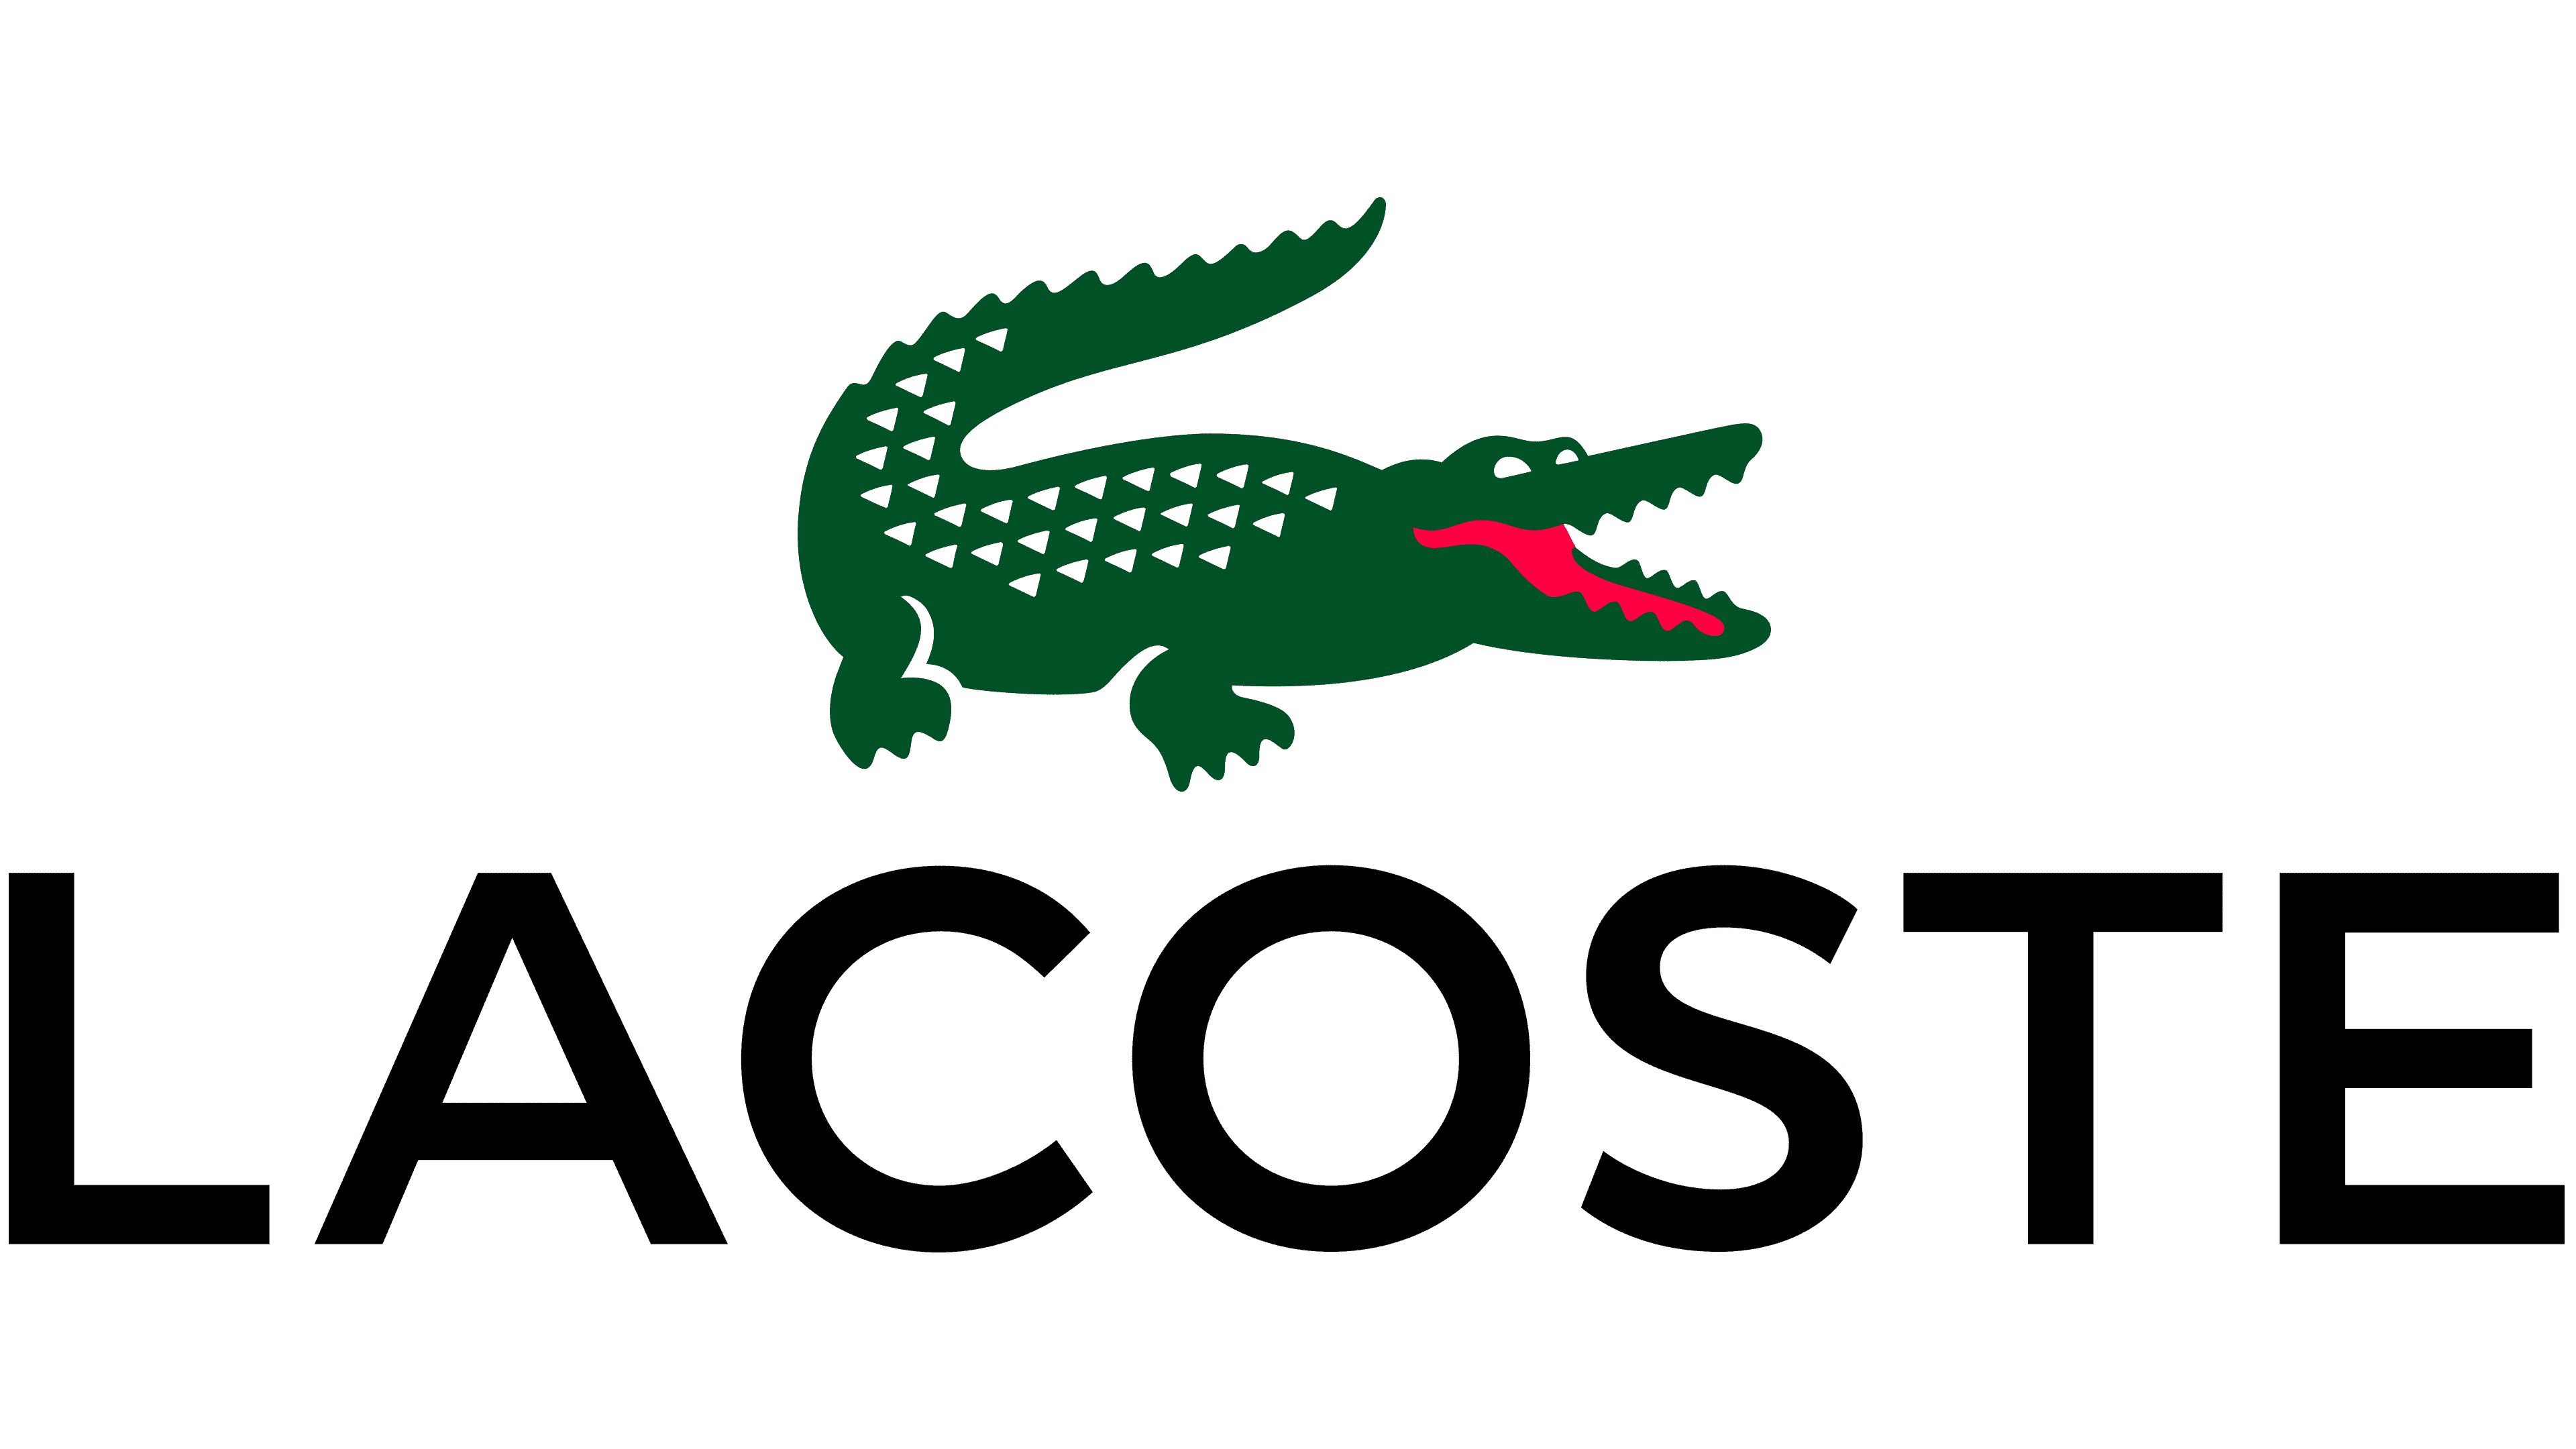 Lacoste Logo Logo